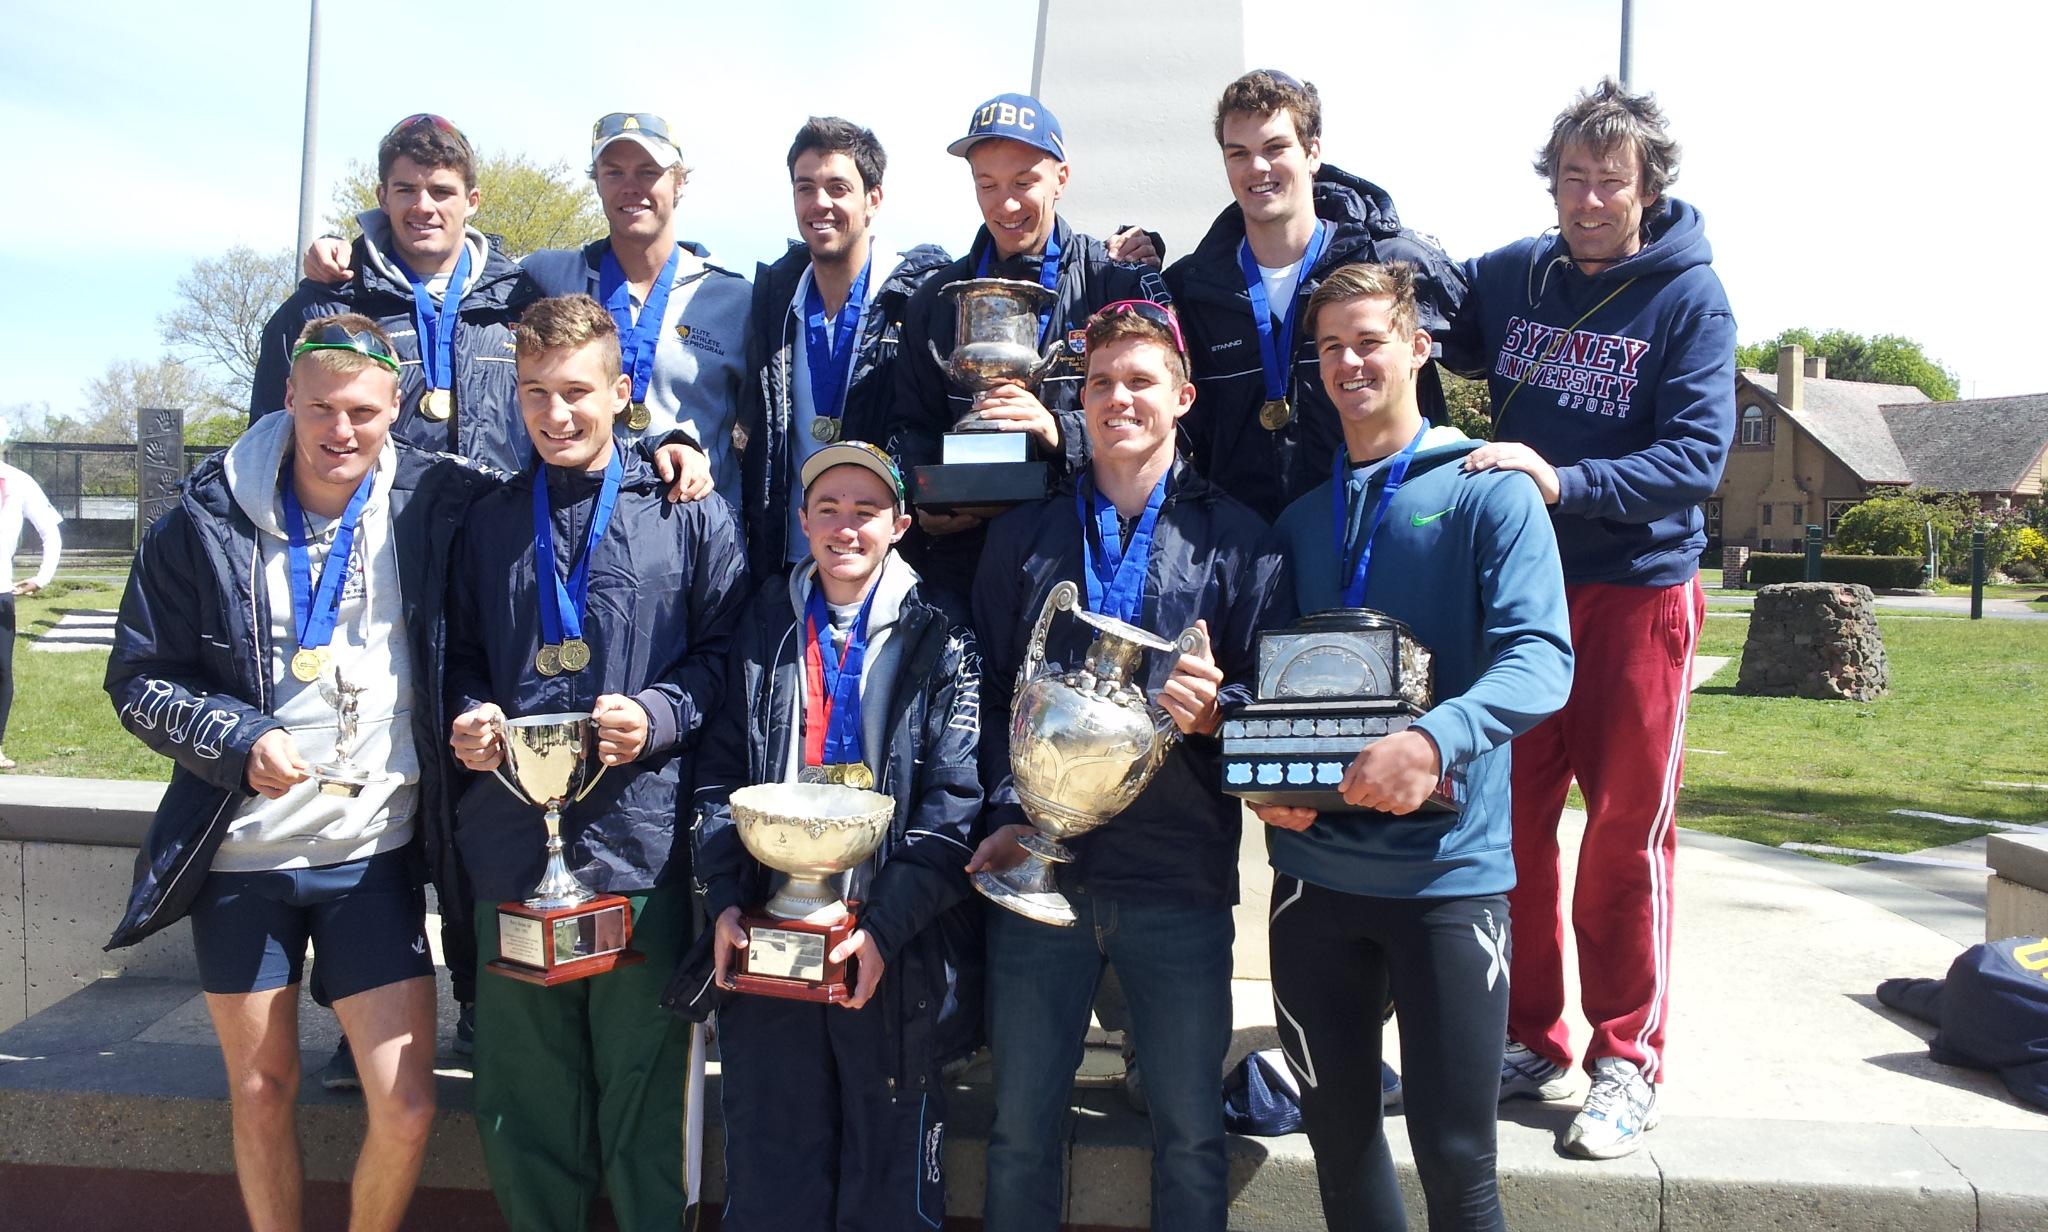 Boat-Club-mens-team-with-silverware-Ballarat-3-Oct-2013.jpg